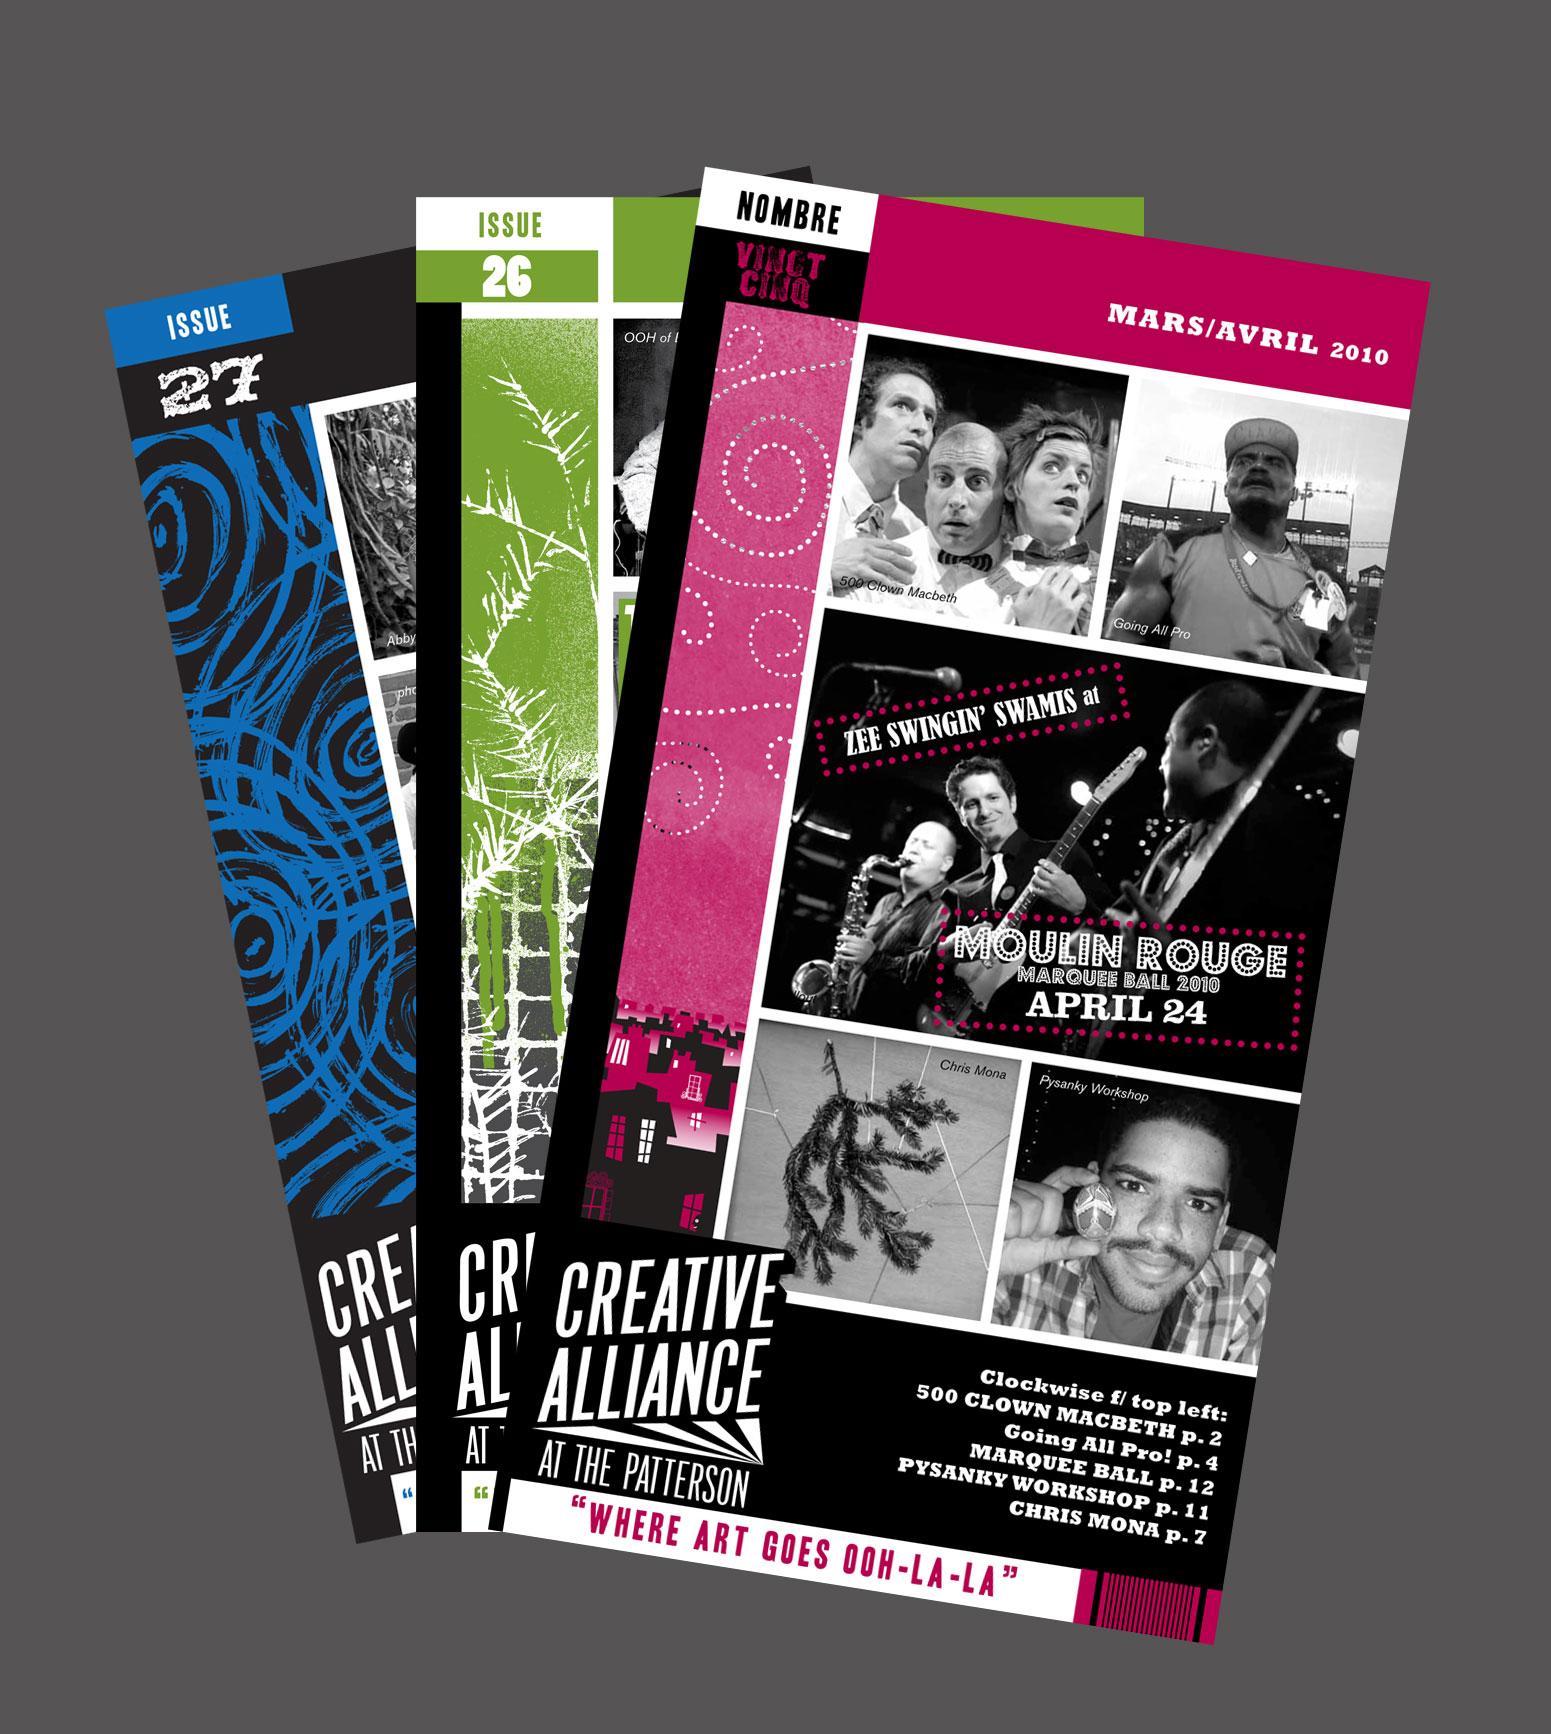 Monthly catalog and event calendar